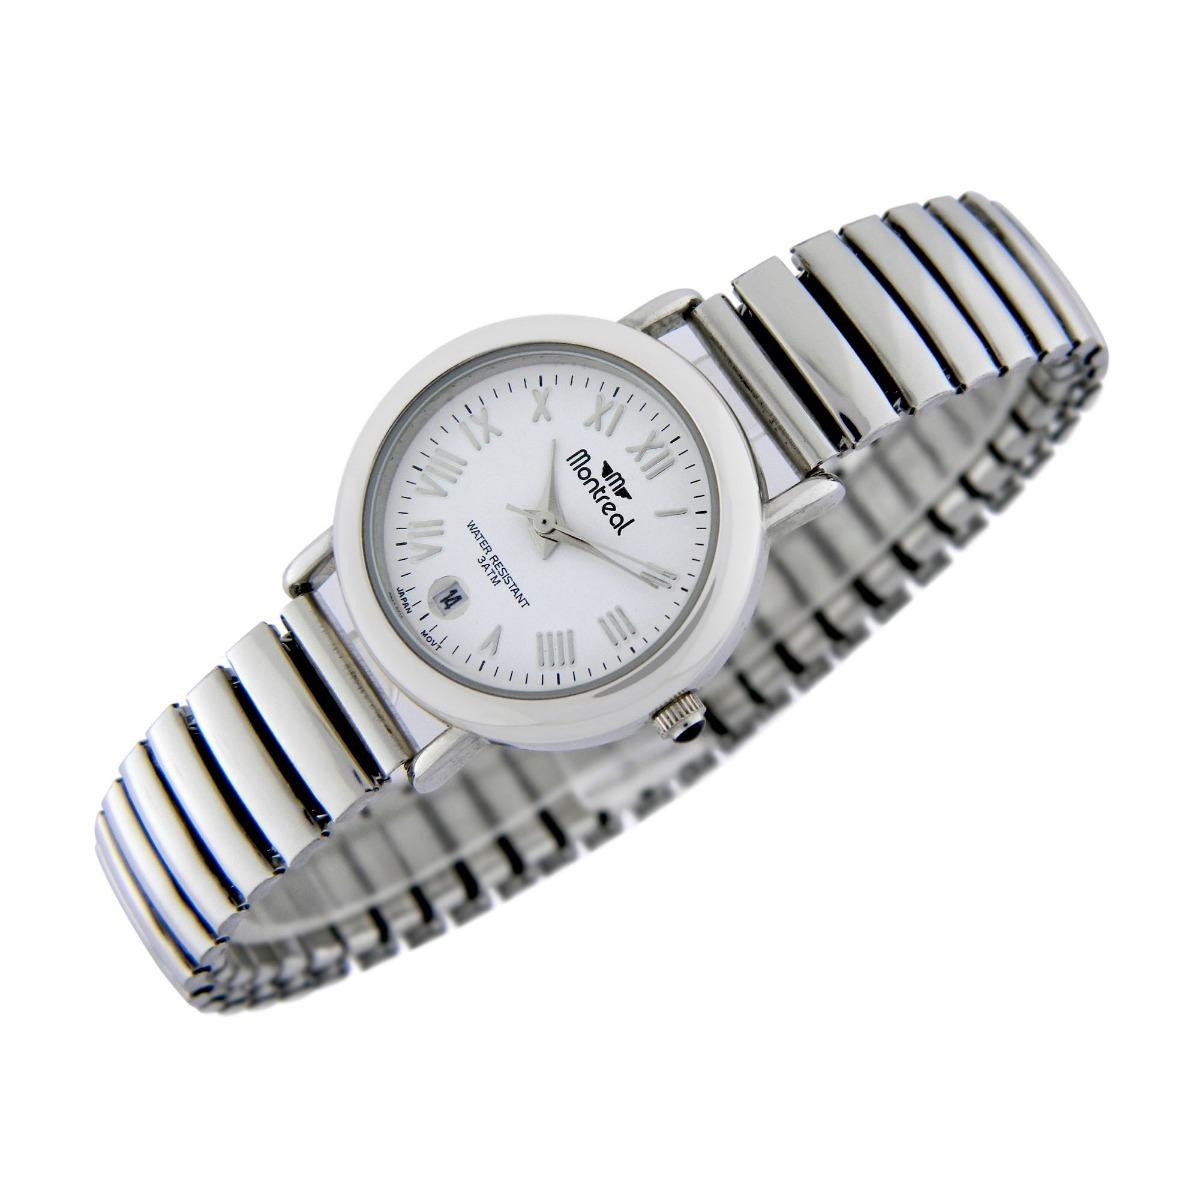 Reloj Montreal Mujer Malla Elastizada Ml322 Envío Gratis -   1.049 ... edfb599309f7